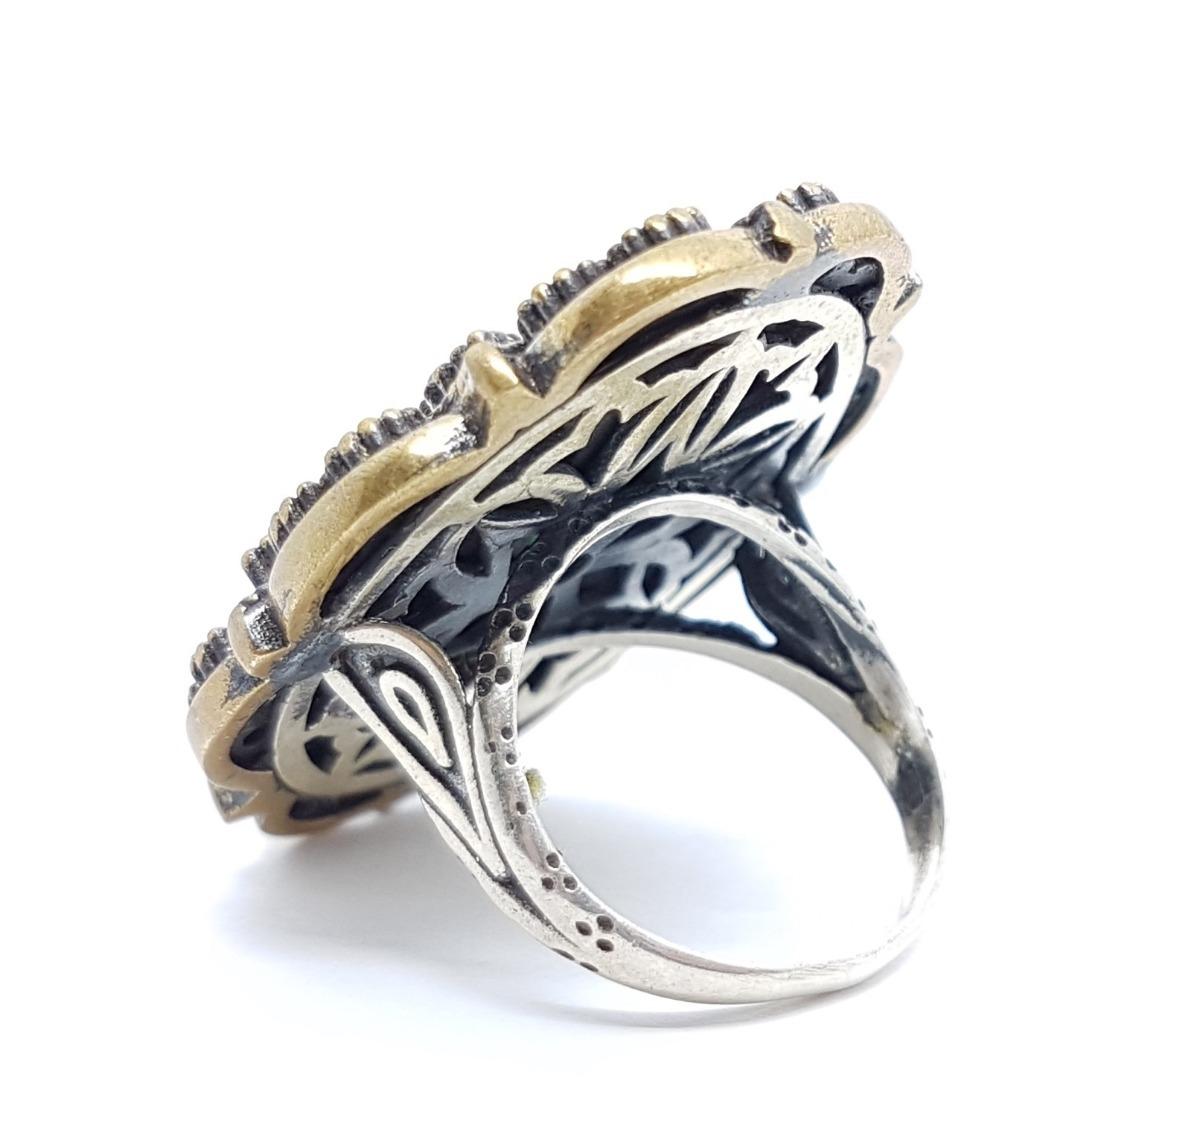 9bff8c75f8 anel prata turca. Carregando zoom.